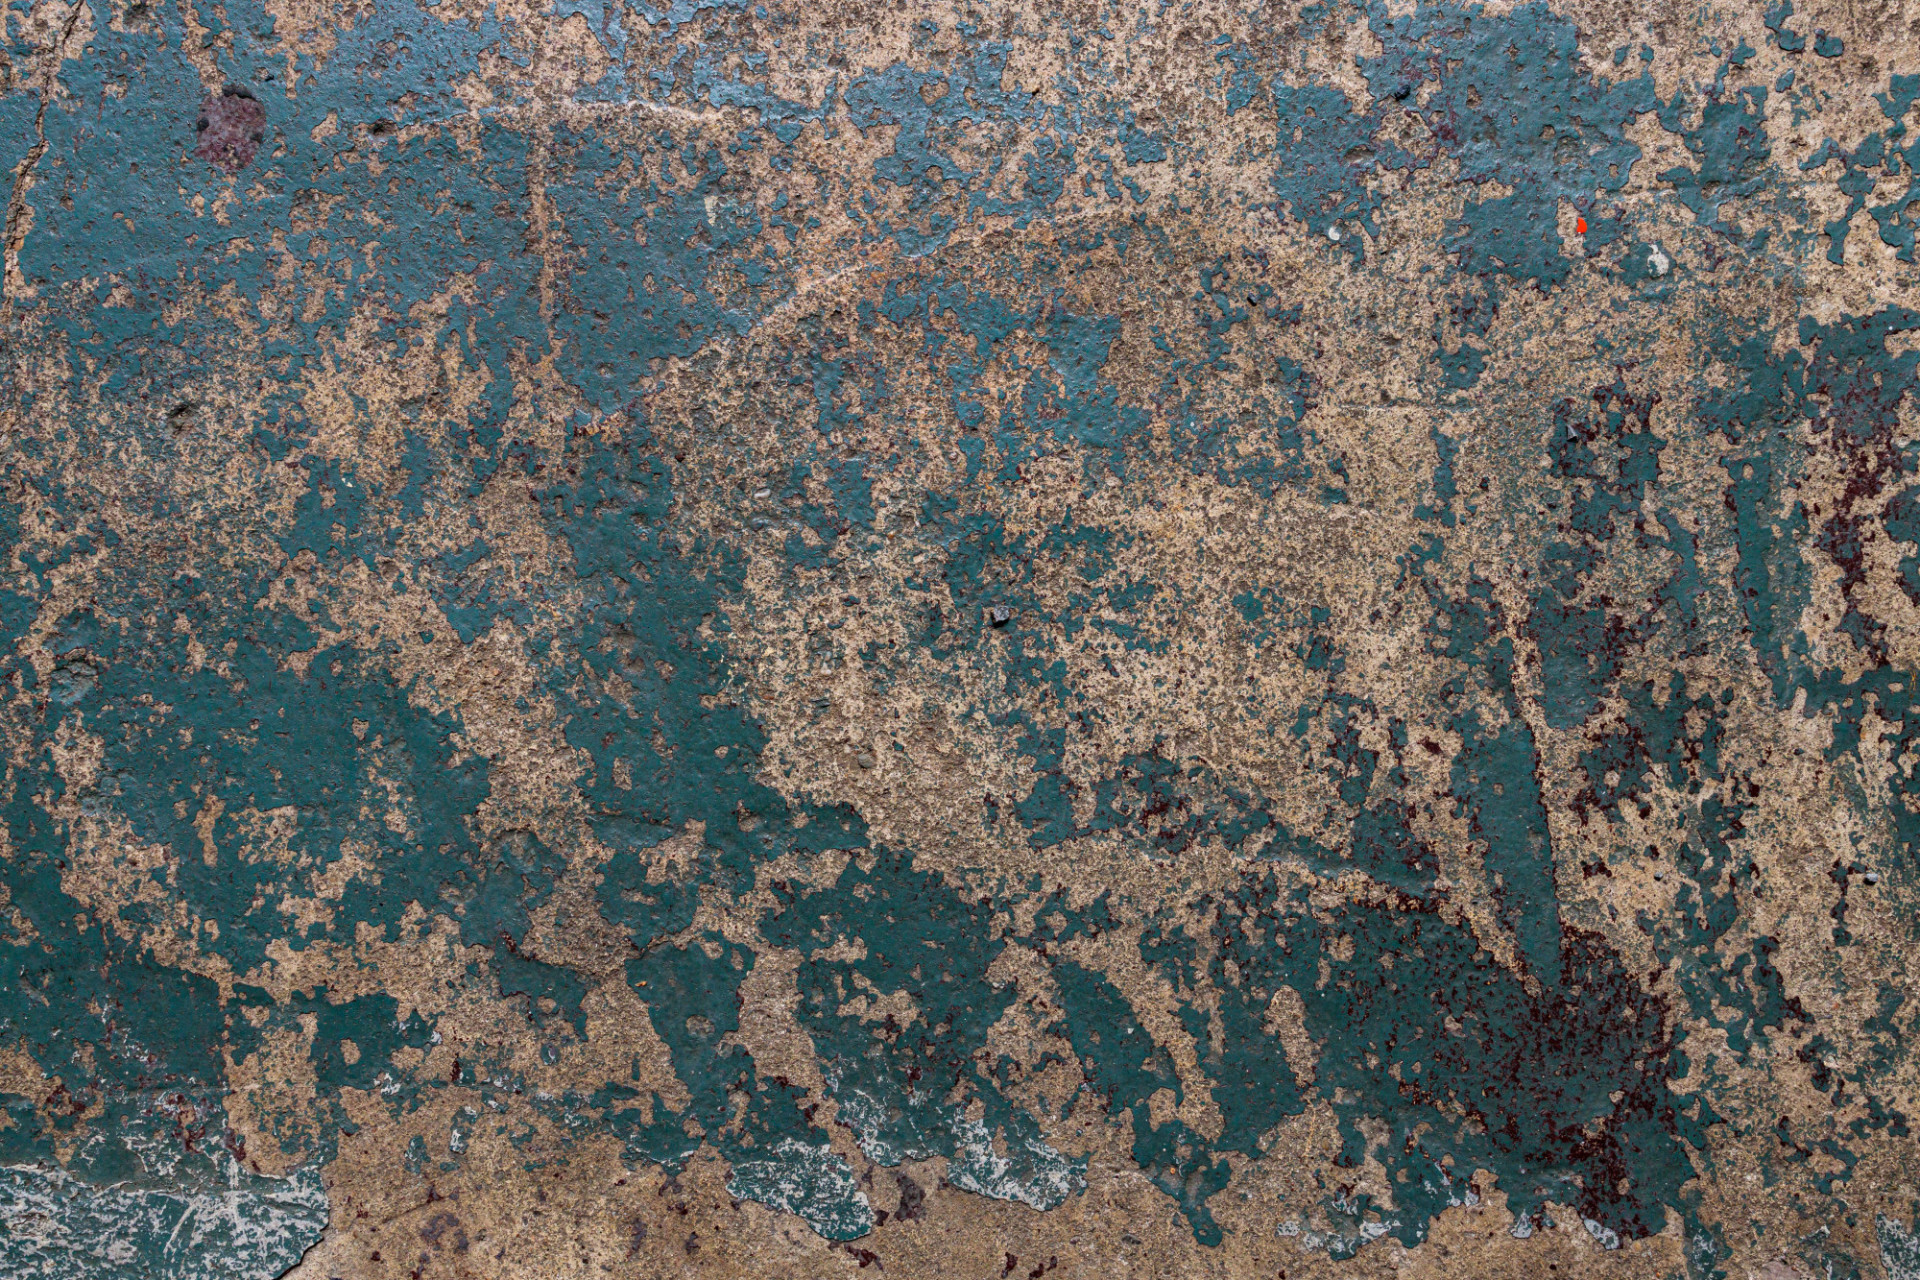 Grunge blue concrete floor texture